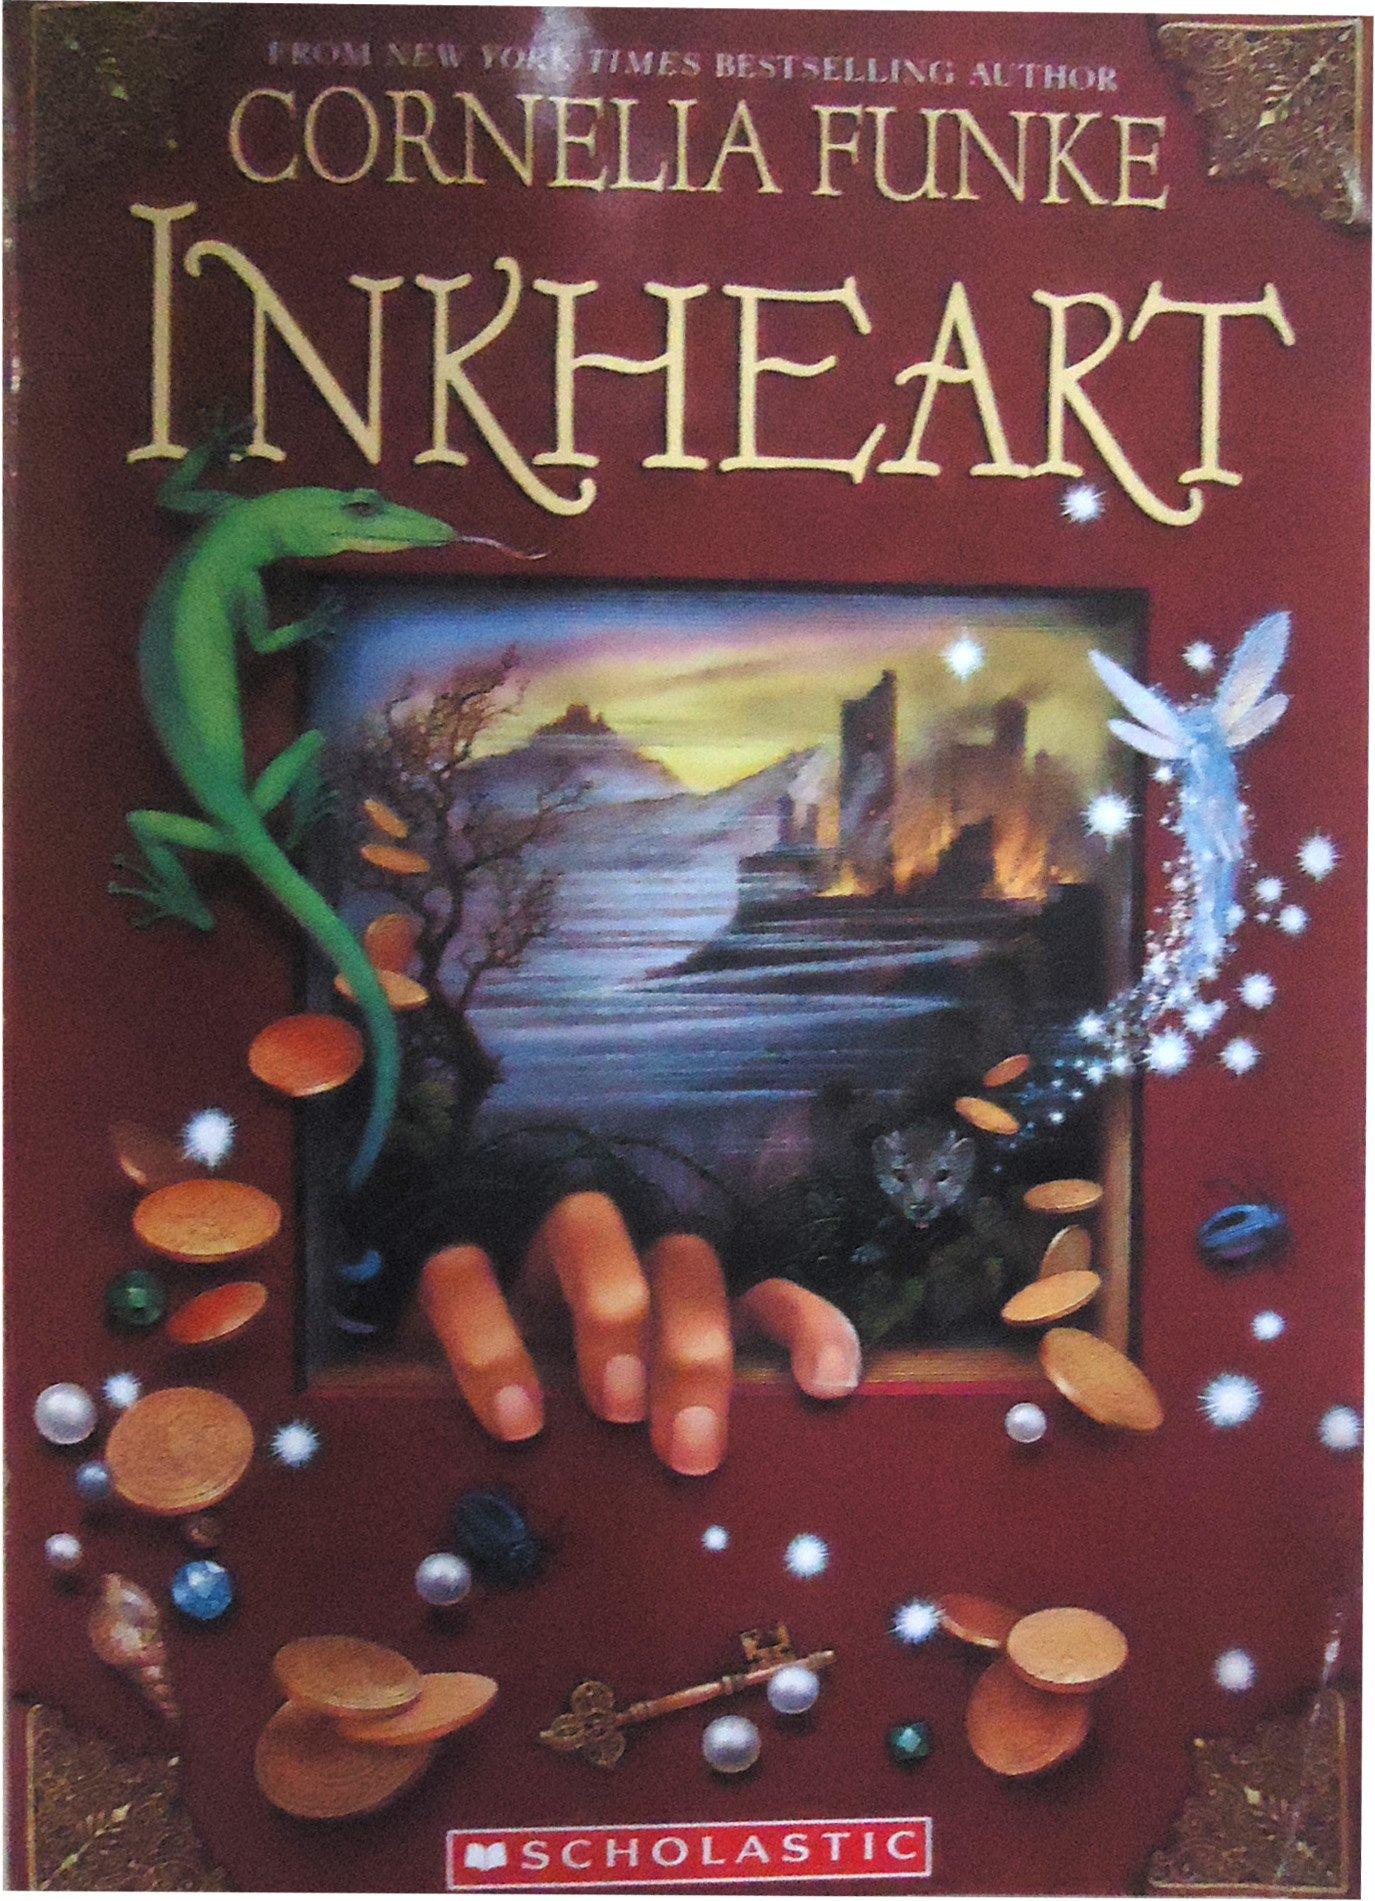 Inkheart (inkheart Trilogy): Cornelia Funke: 9780439709101: Amazon:  Books